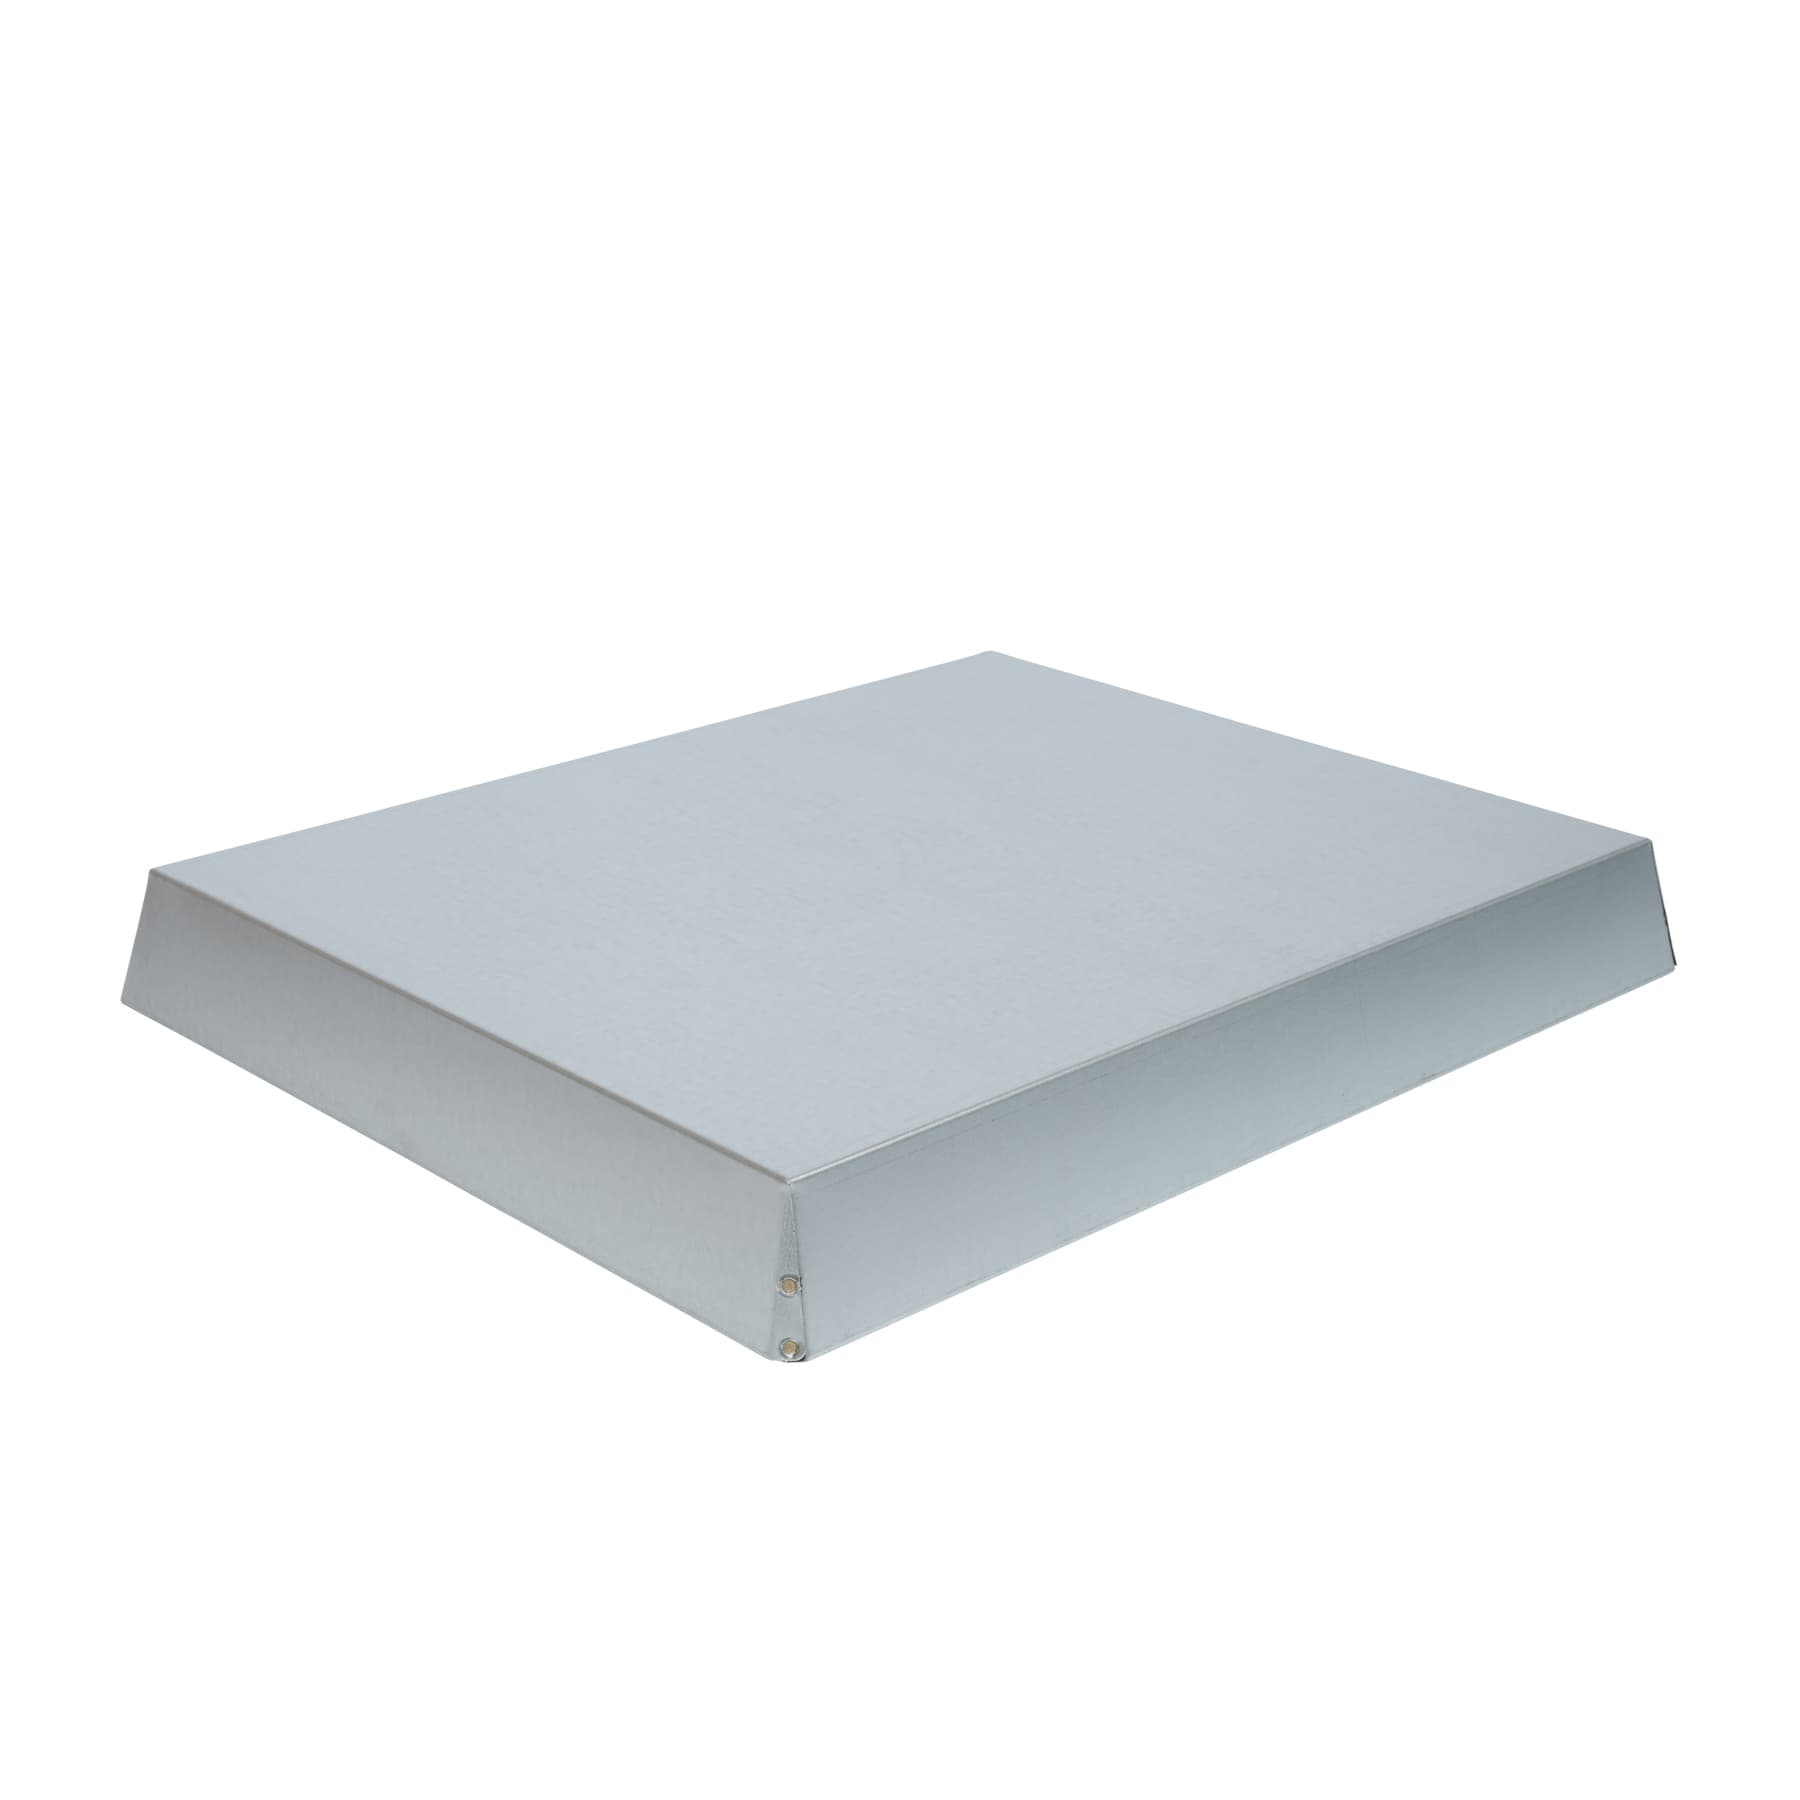 Blechdeckel, verzinkt konisch Innenmaß 425 x 465 x 65 mm für Liebigbeute DN, Beste Qualität 0,7 mm dick, Made in Germany!